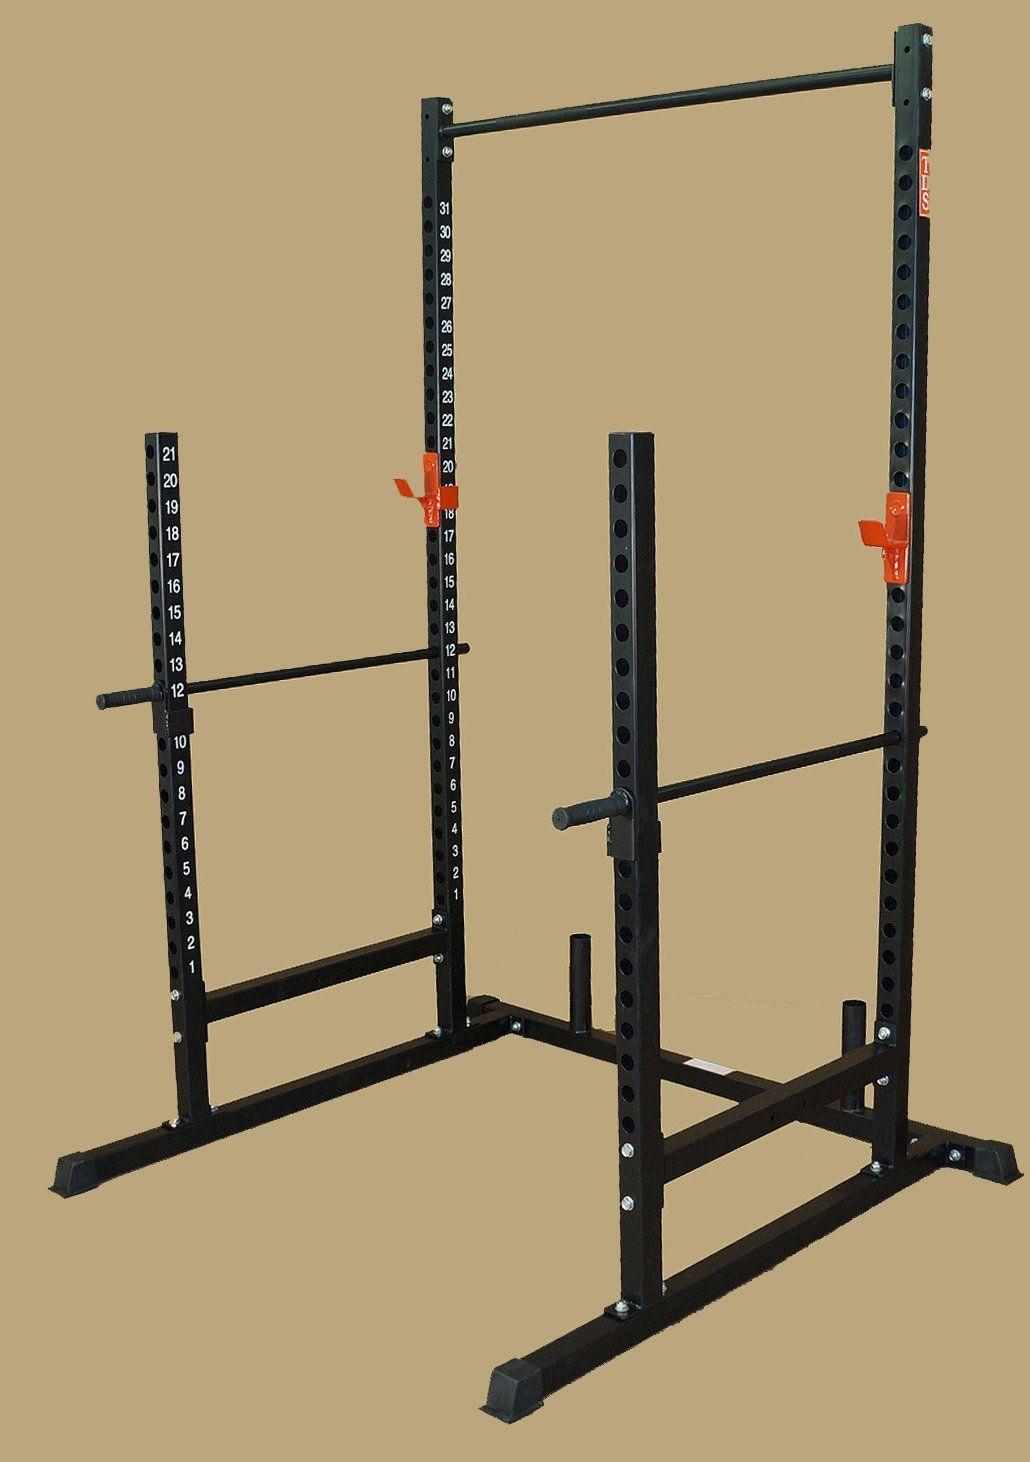 Tds power squat open rack station sports for Squat station